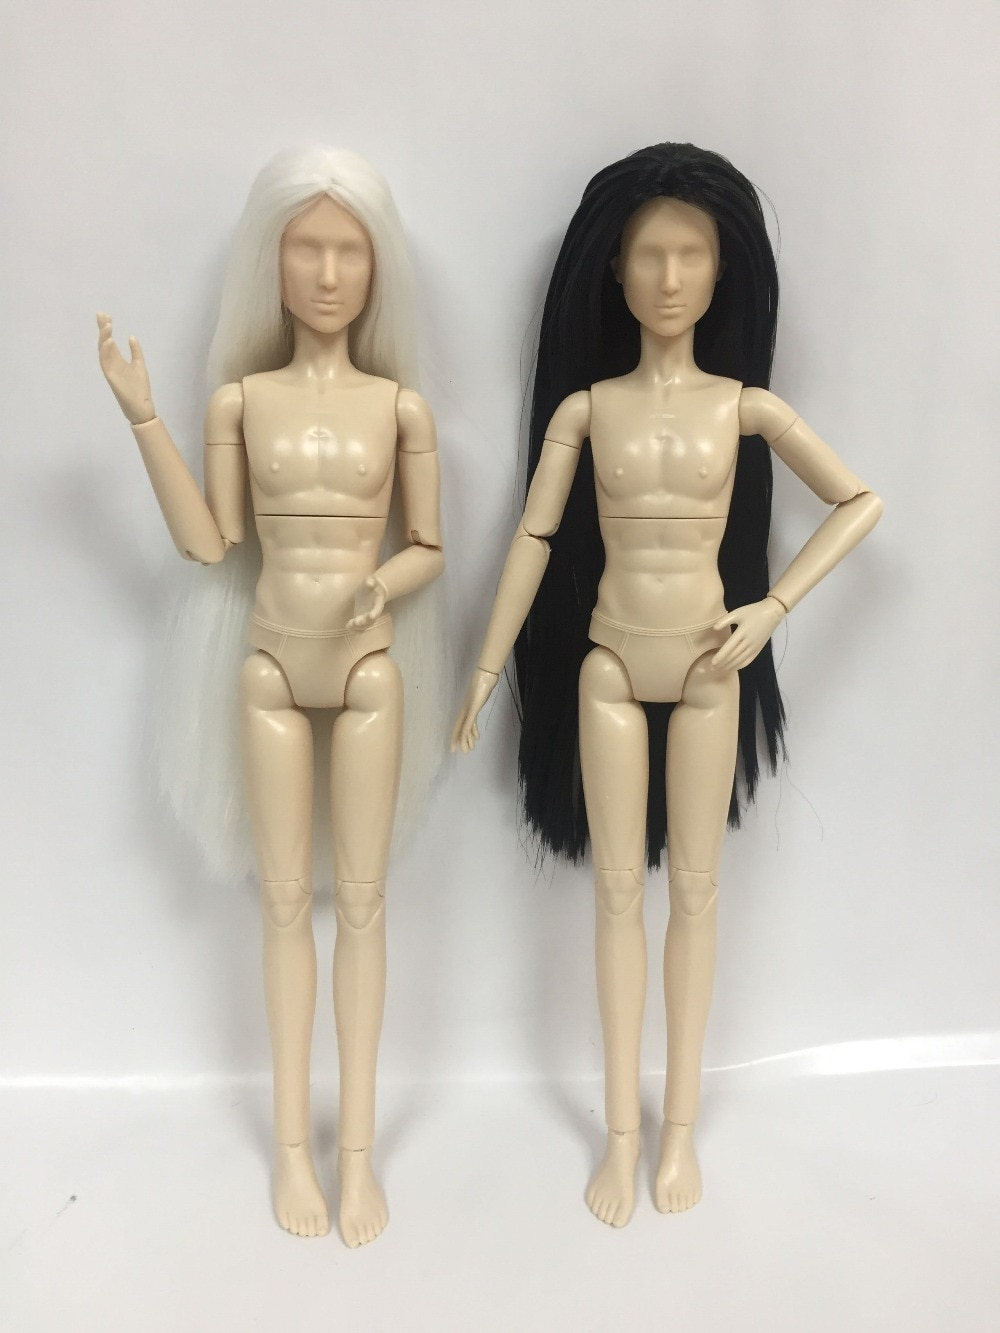 Muñeca masculina desnuda, DIY para muñecas, OB doll, sin maquillaje, muñecas masculinas de 31cm